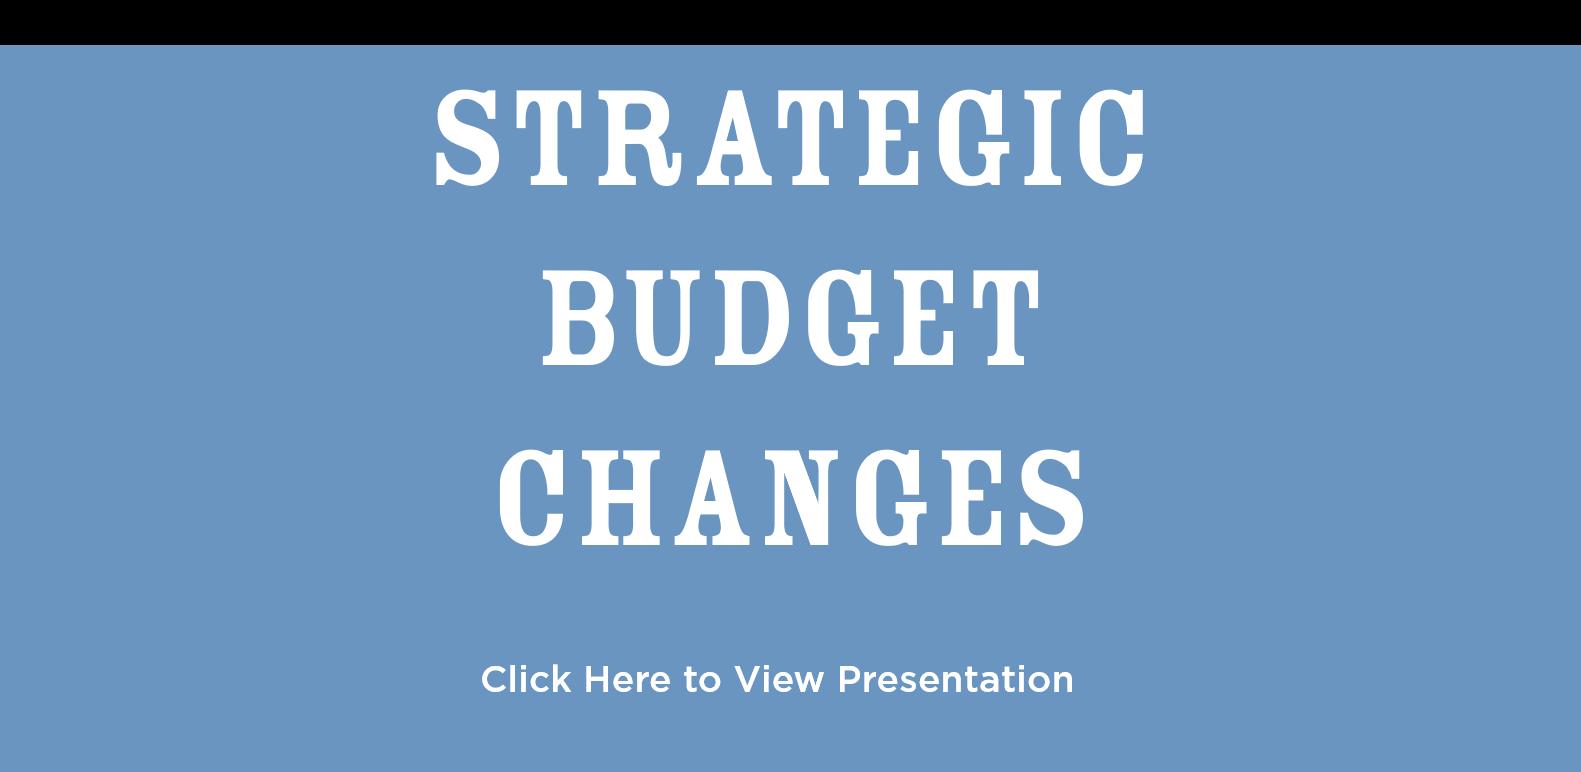 Strategic Budget Changes